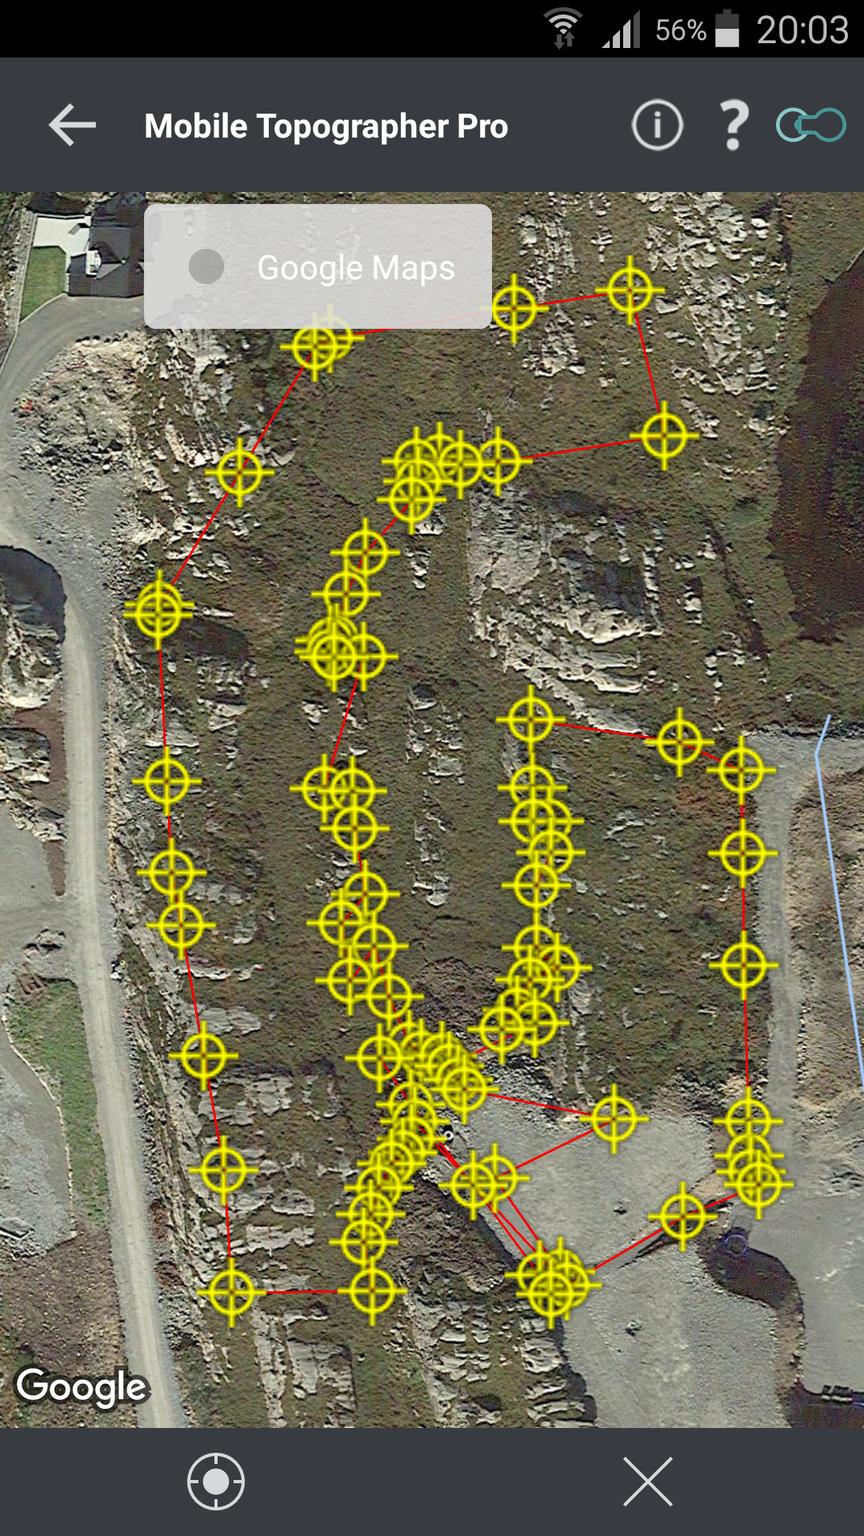 Easiest way yo get UTM coordinates - RTK / Post-processing